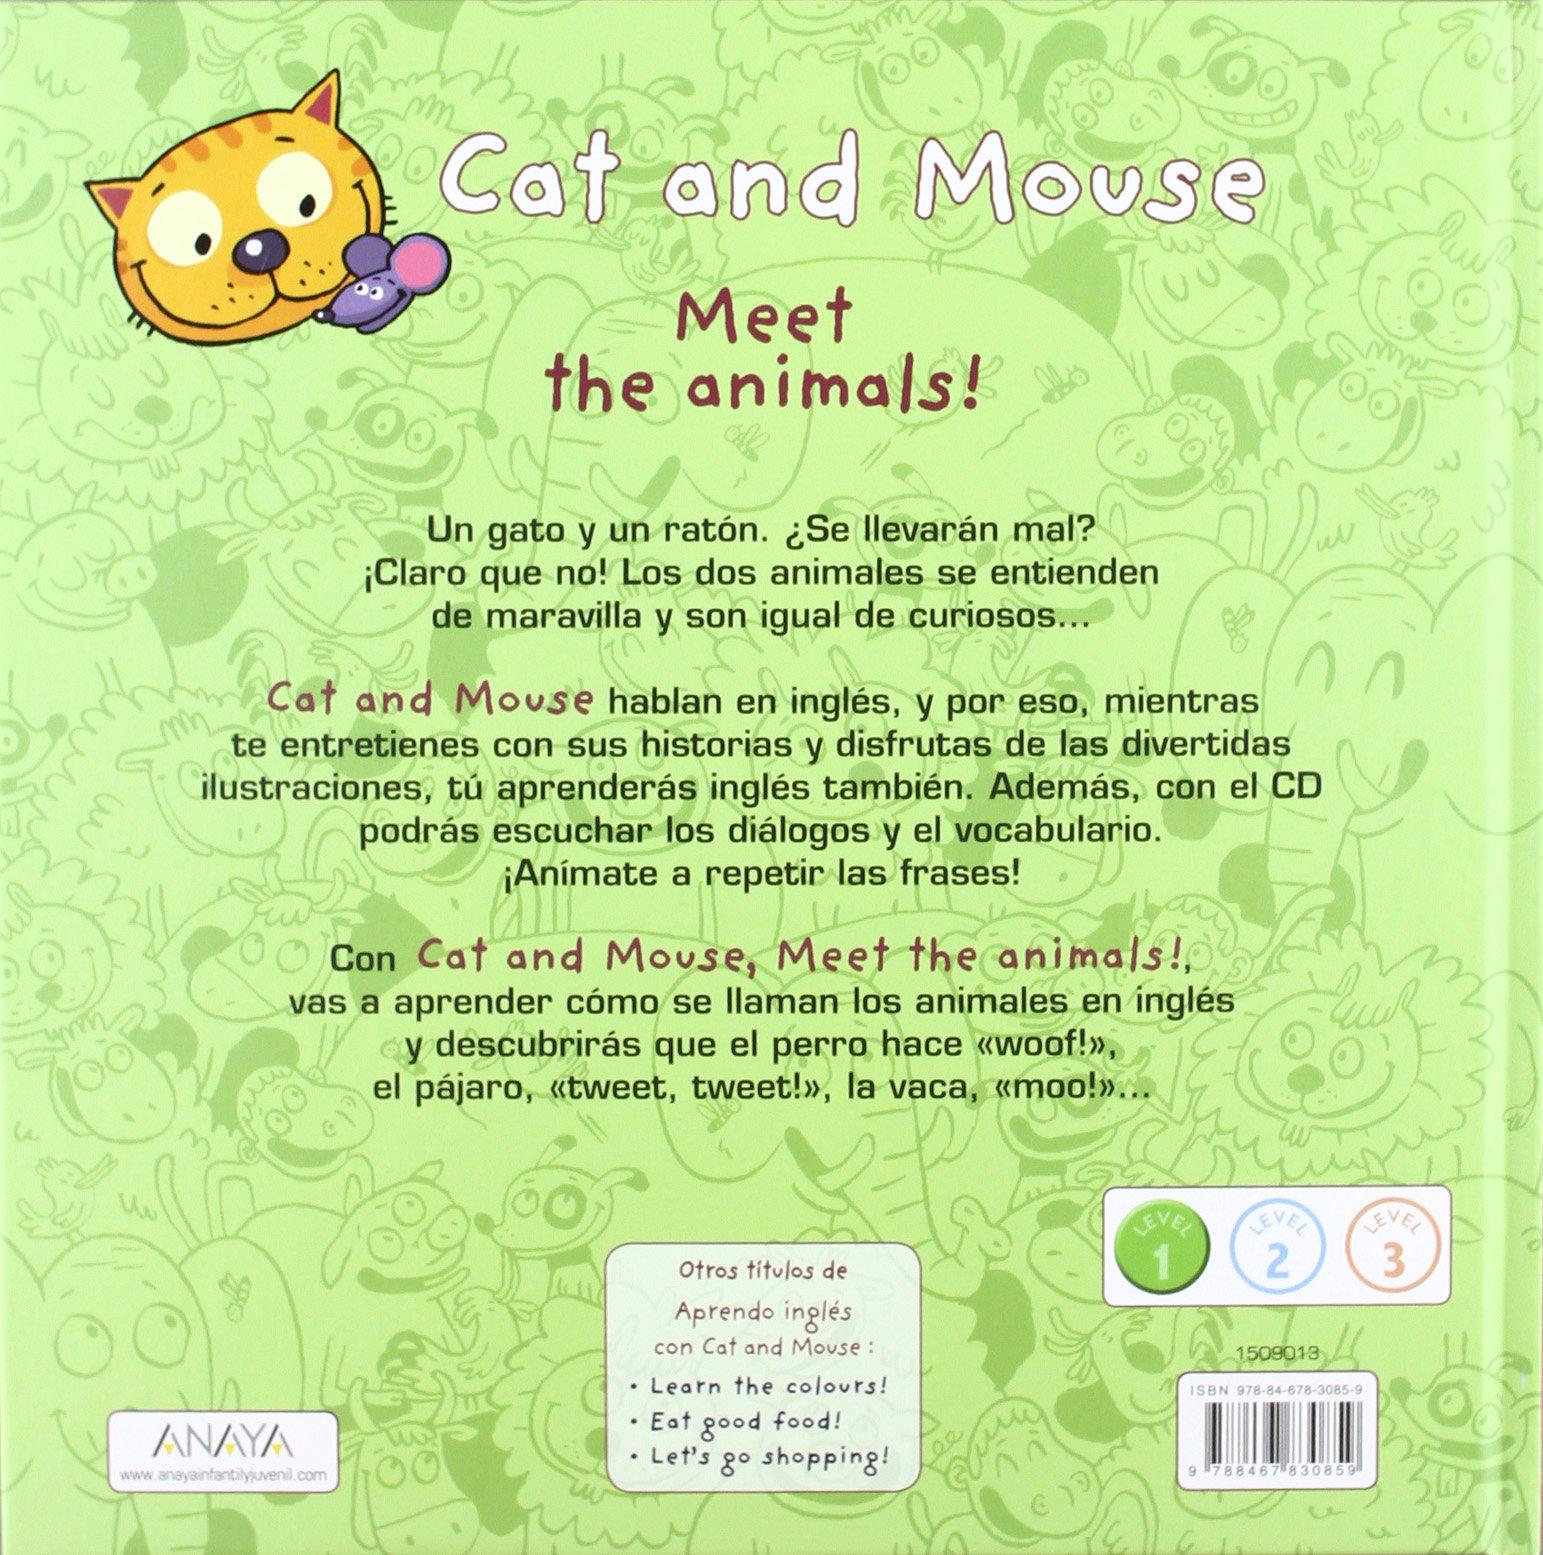 Cat and Mouse: Meet the animals!: Loïc Méhée Stéphane Husar : 9788467830859: Amazon.com: Books